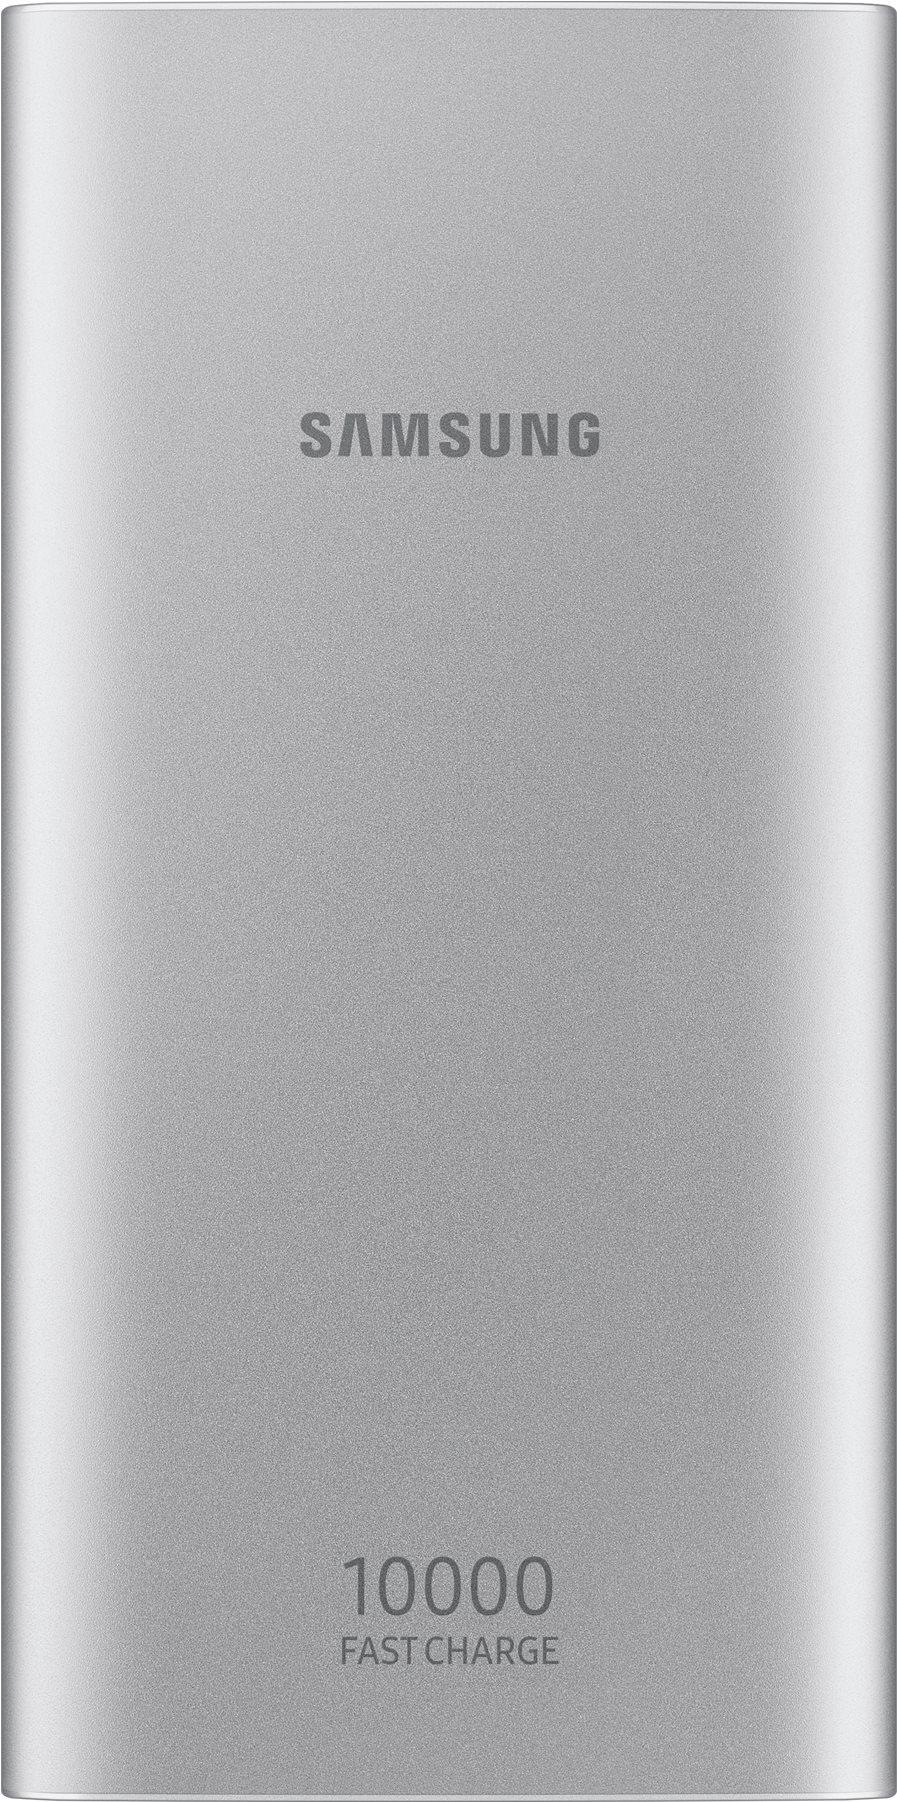 Samsung Power Bank 10000mAh USB-C Fast Charge ezüst